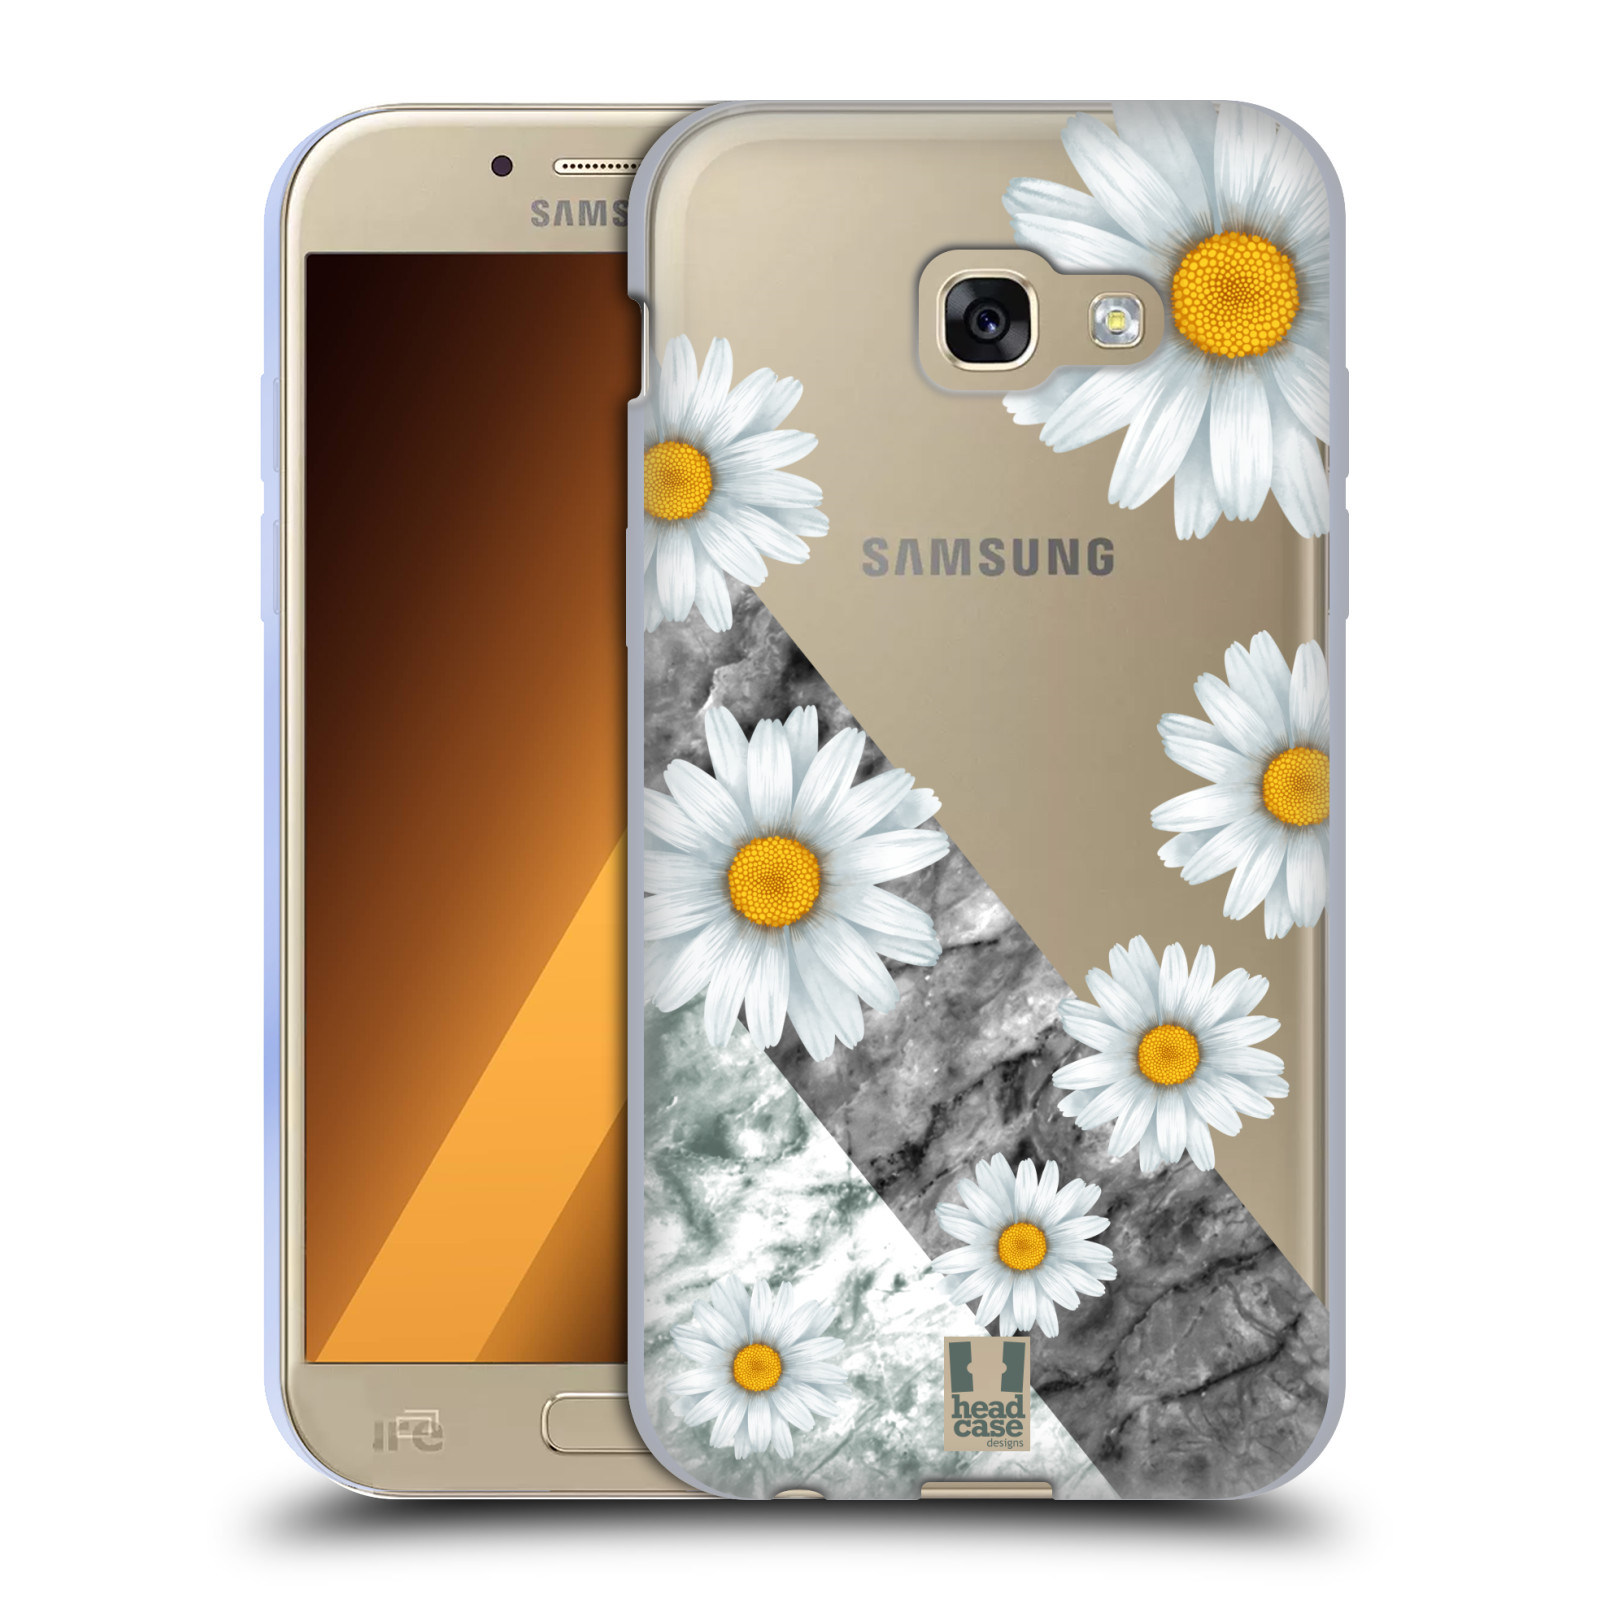 Silikonové pouzdro na mobil Samsung Galaxy A5 (2017) - Head Case -  Kopretiny a empty e22de2e4731